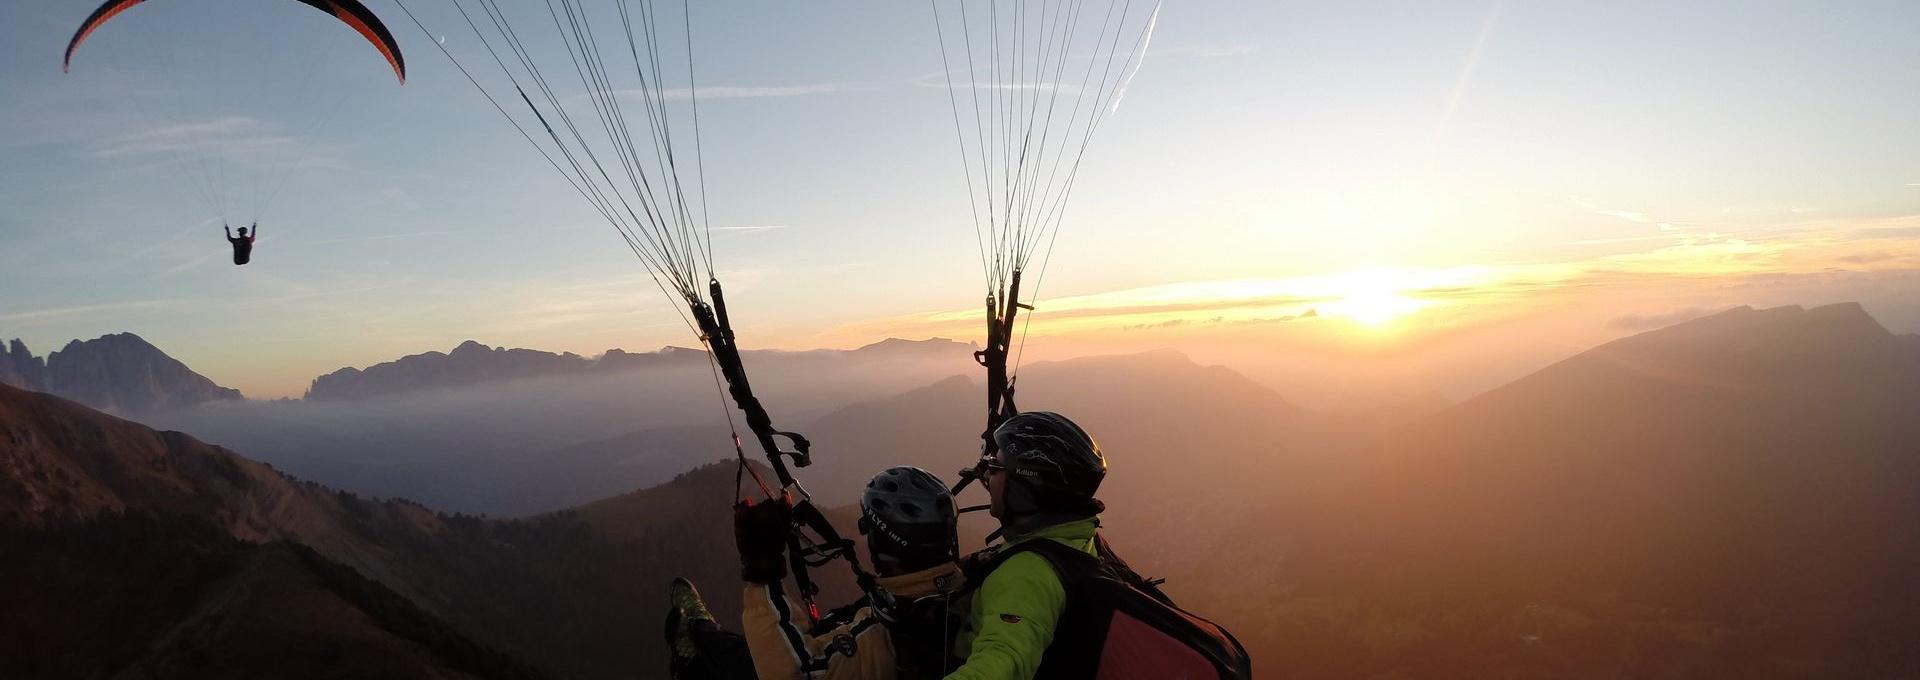 Paragliding emotion - Val Gardena